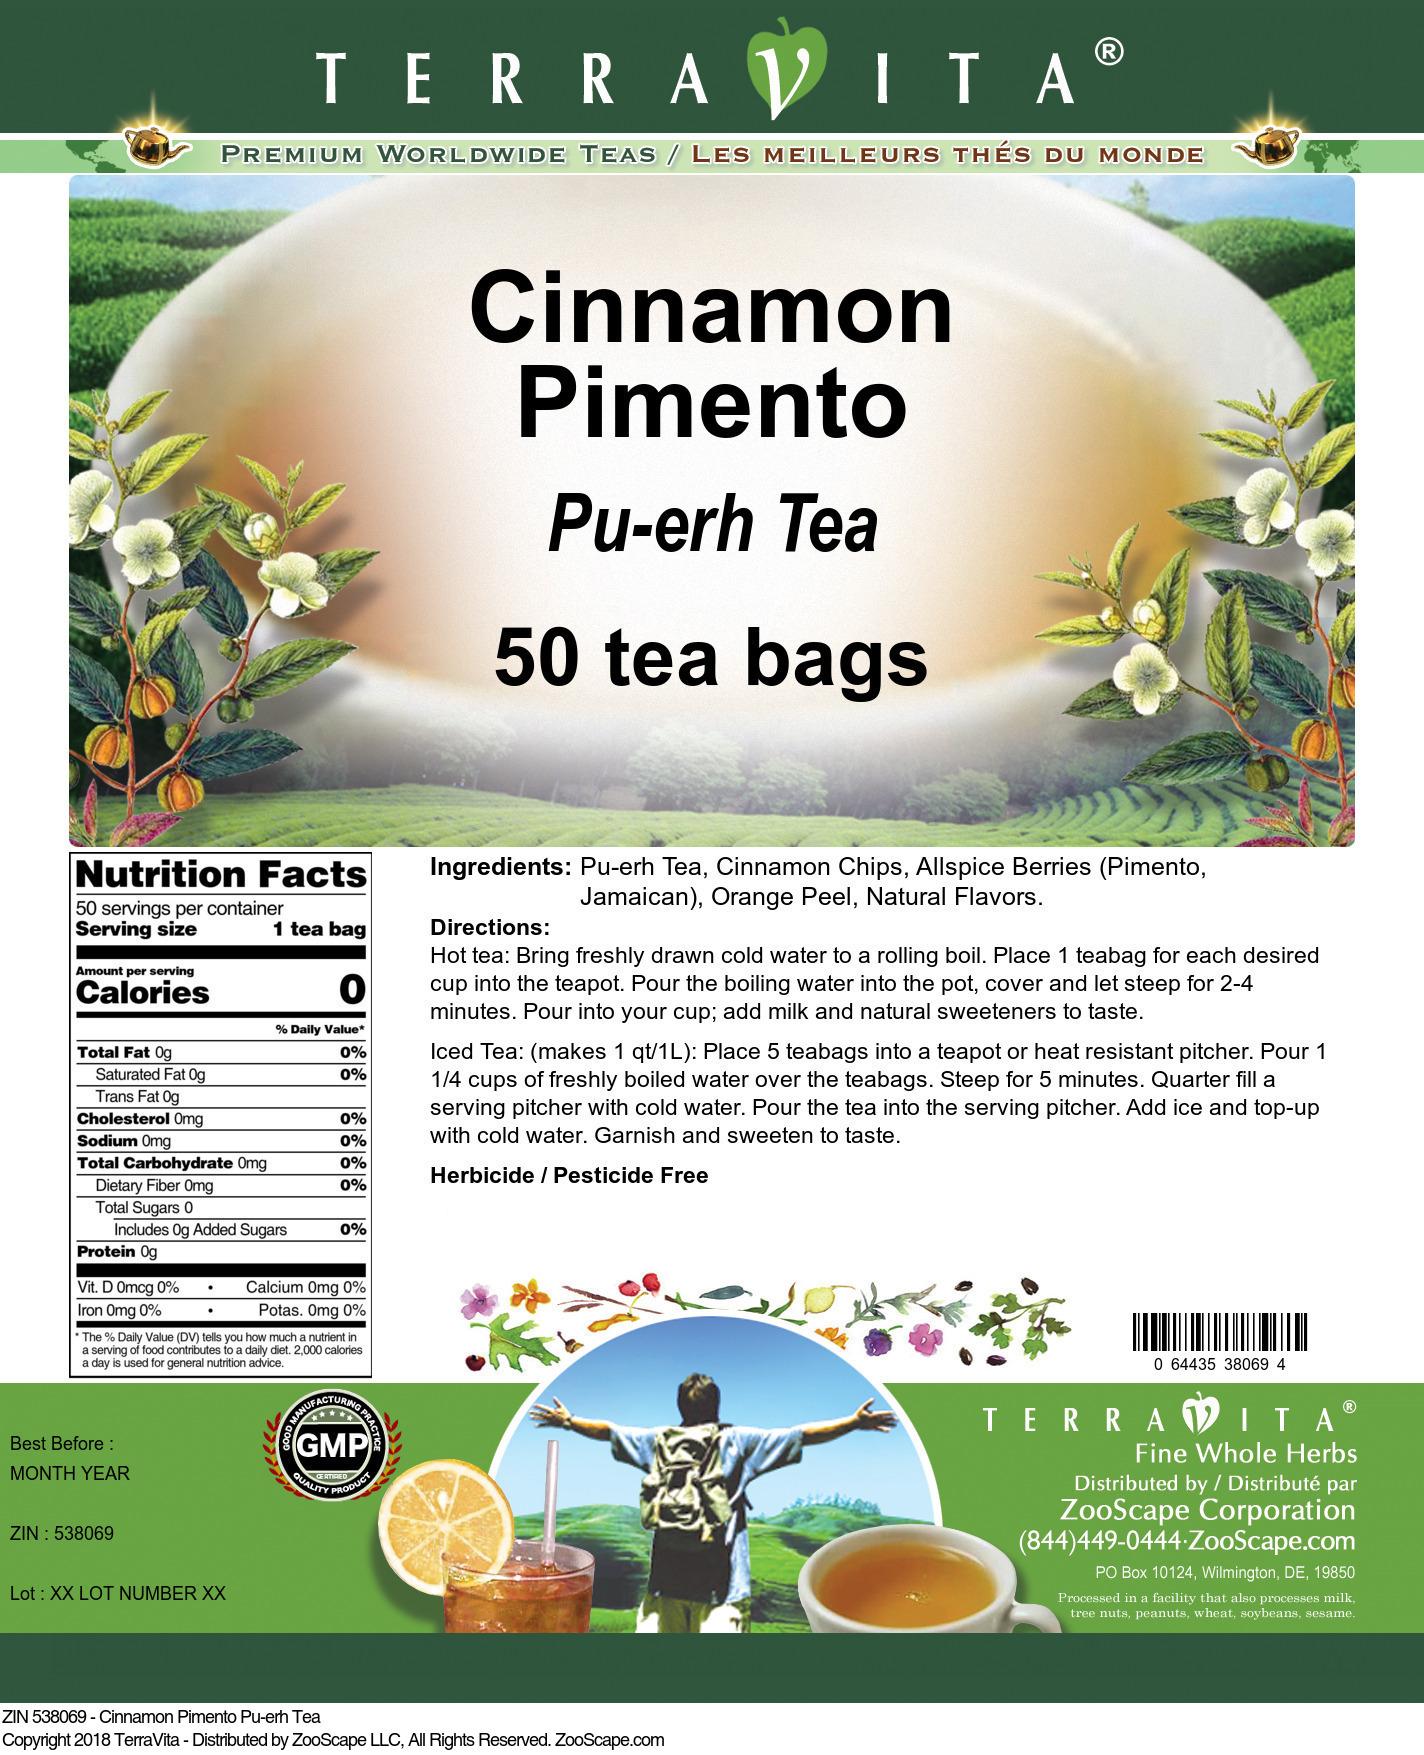 Cinnamon Pimento Pu-erh Tea